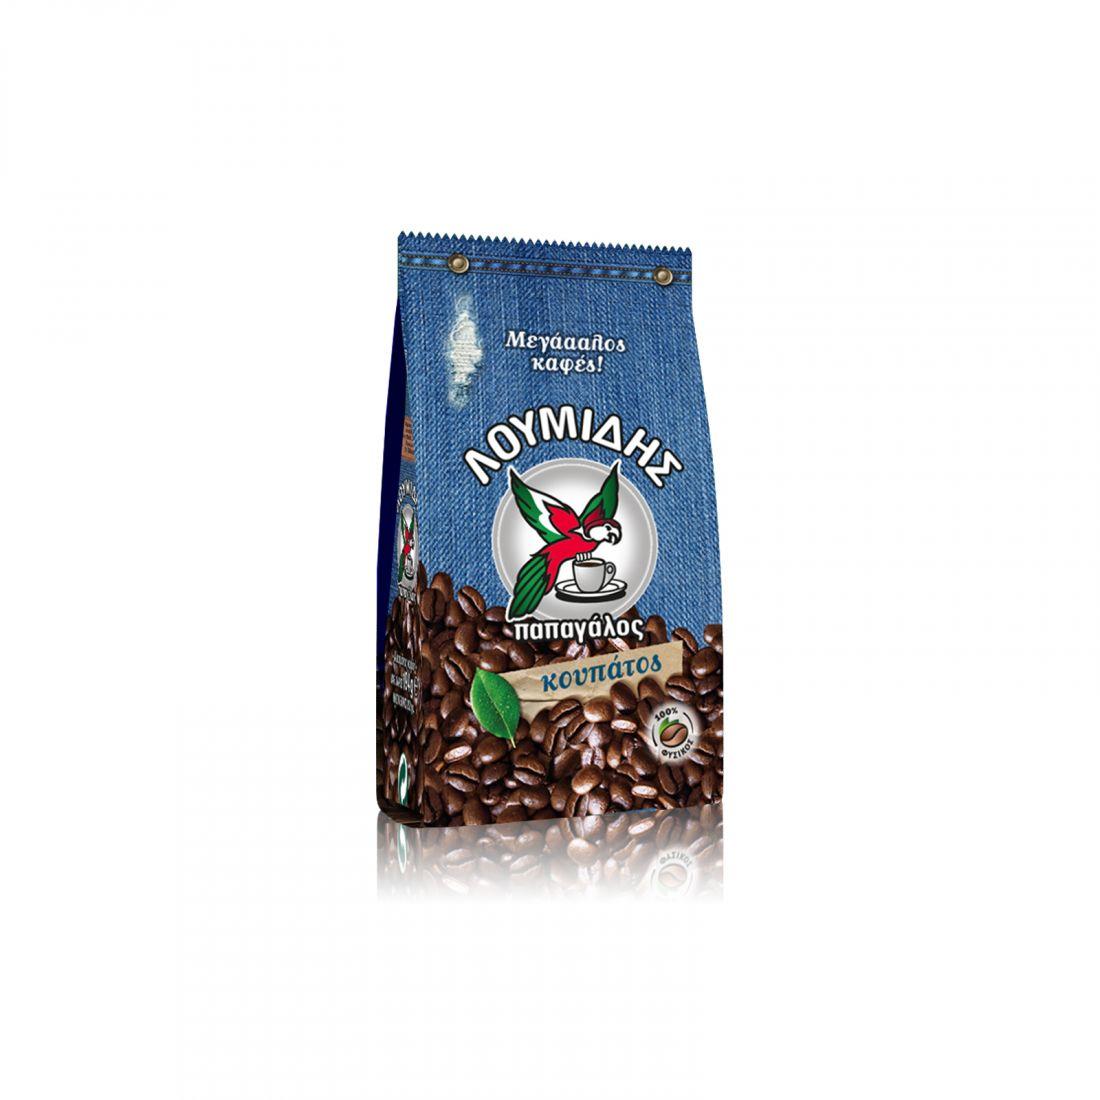 Кофе натуральный молотый Loumidis Papagalos светлой обжарки - 194 гр